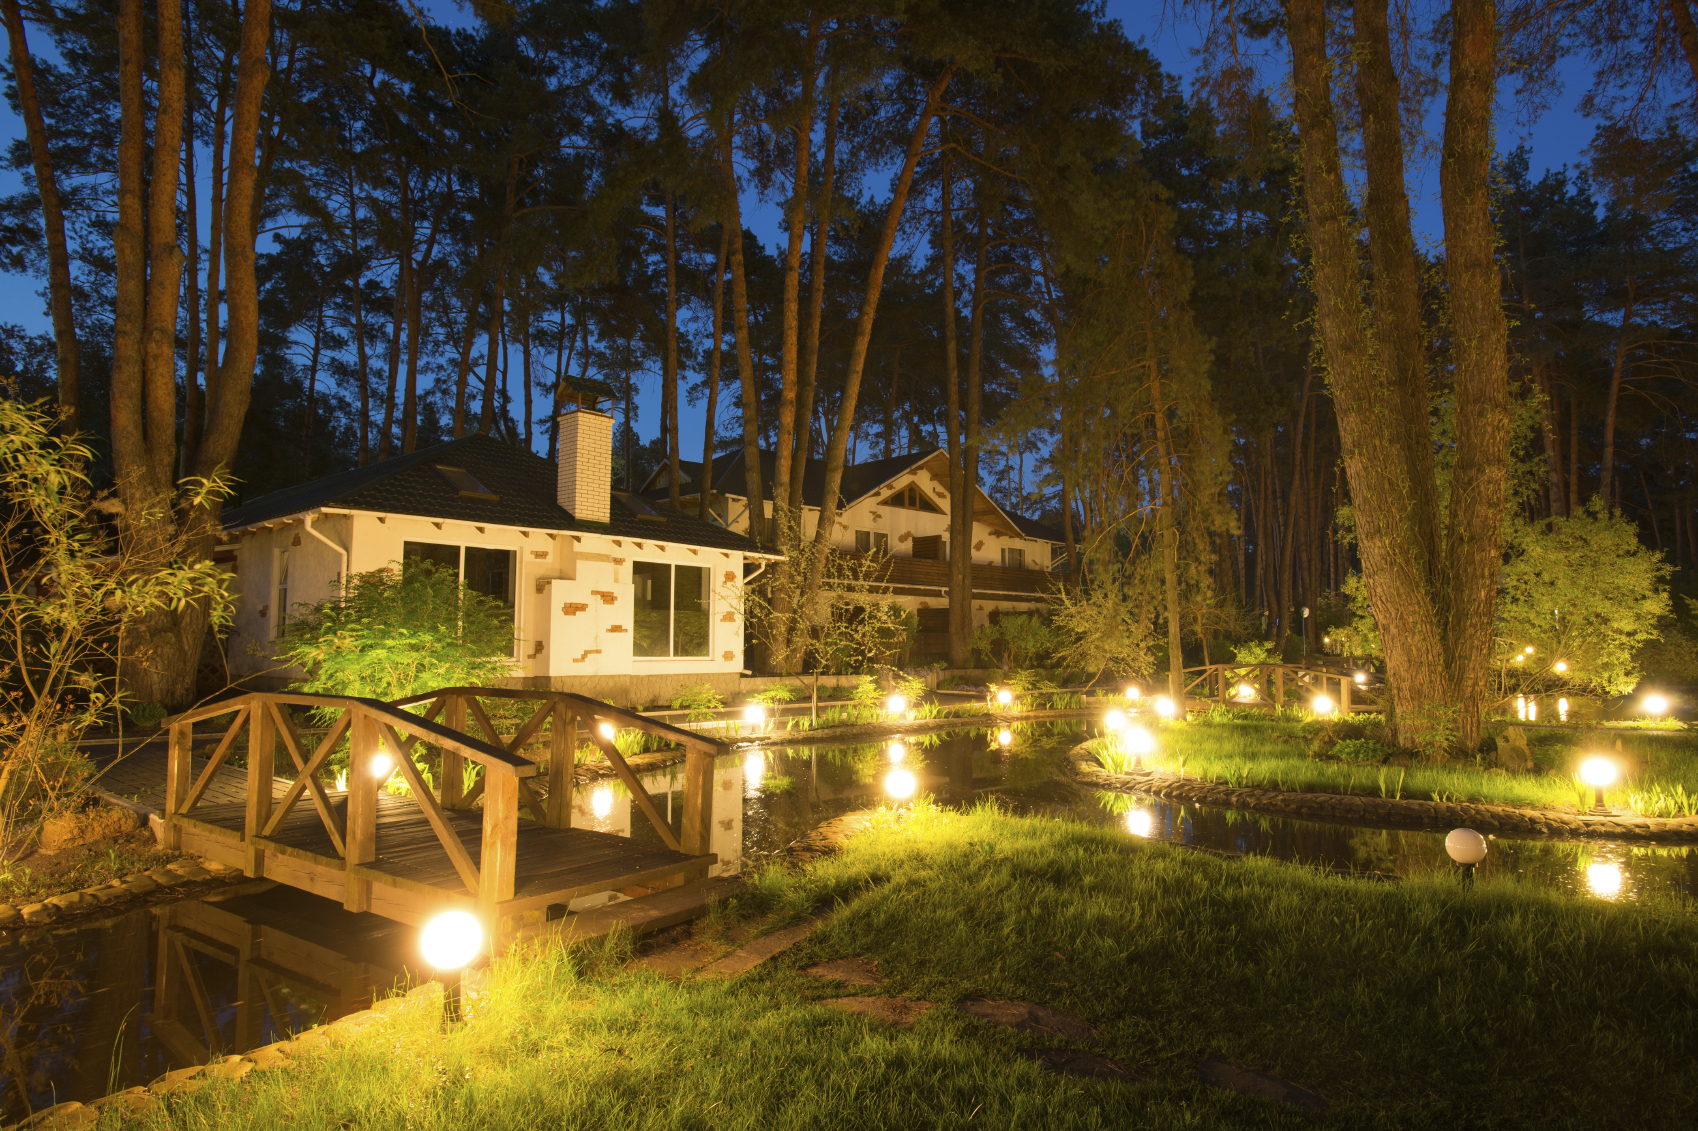 Landscape lighting cost guide in 2018 contractorculture aloadofball Gallery